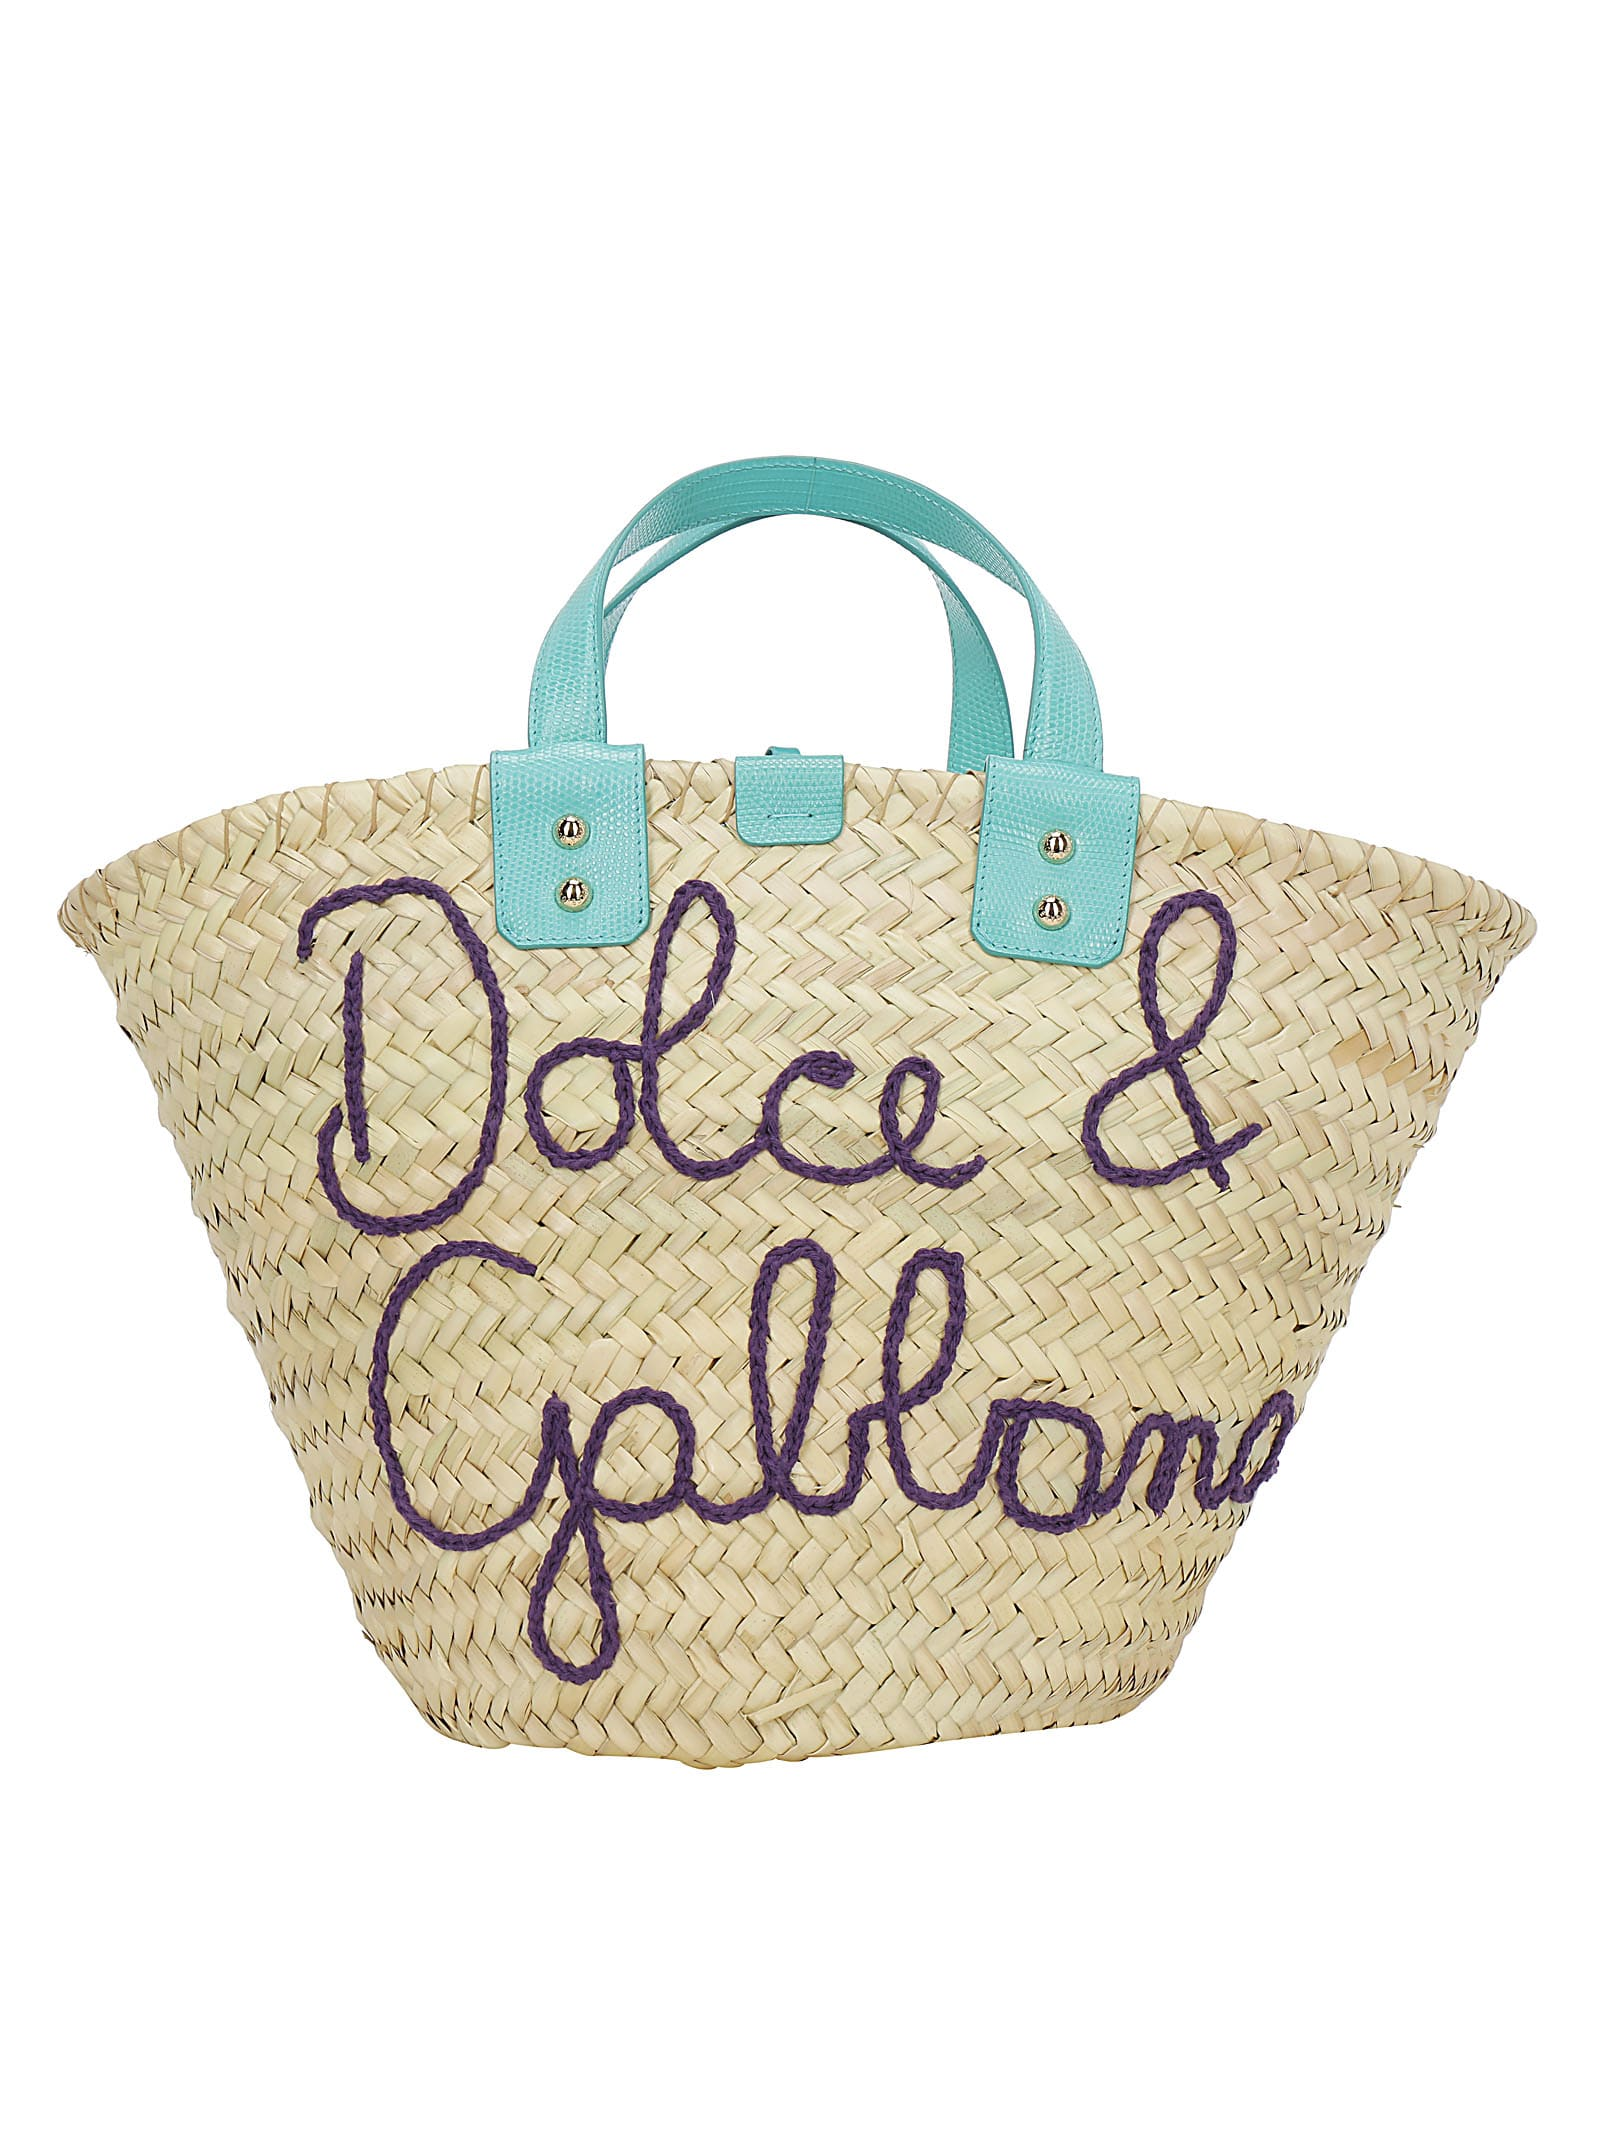 Dolce & Gabbana Kendra Bucket Handbag